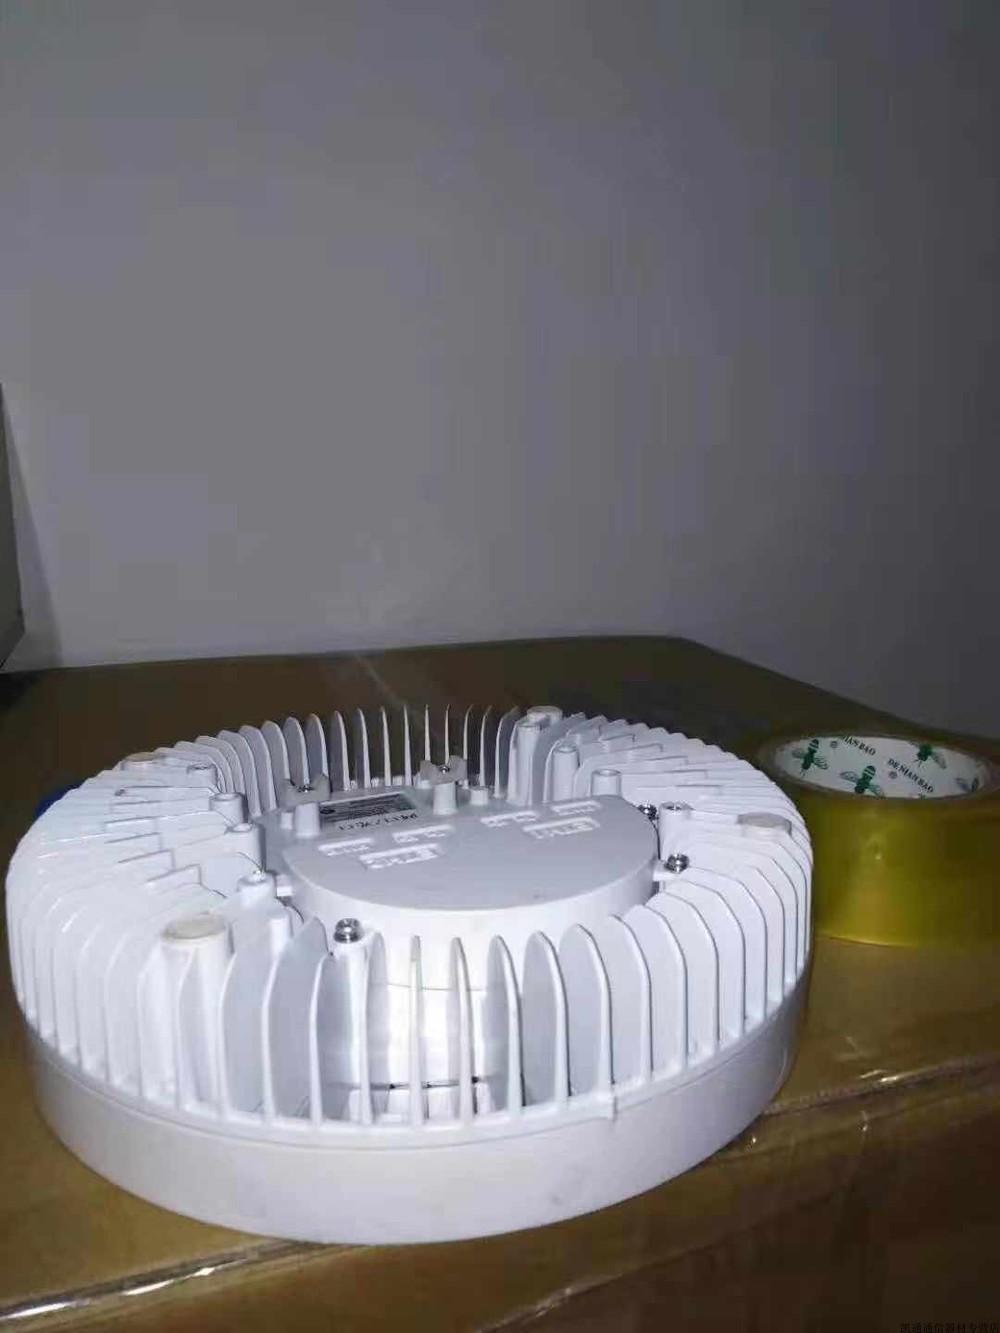 Huawei Lamp site pRRU 5920-5923 for Single-Mode Remote Radio Unit